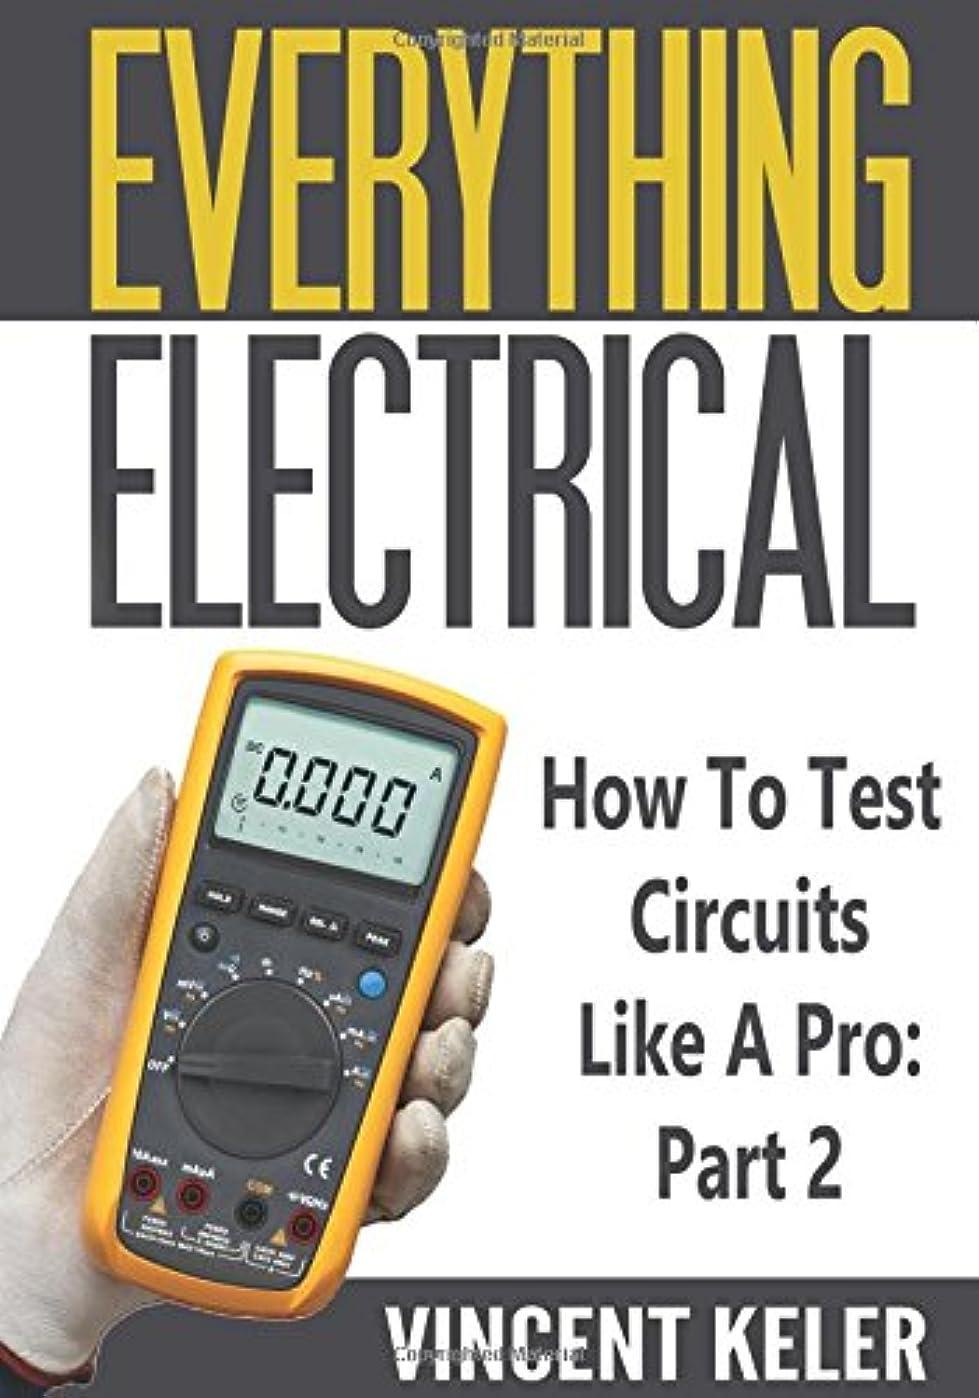 風予算改善Everything Electrical How To Test Circuits Like A Pro Part 2